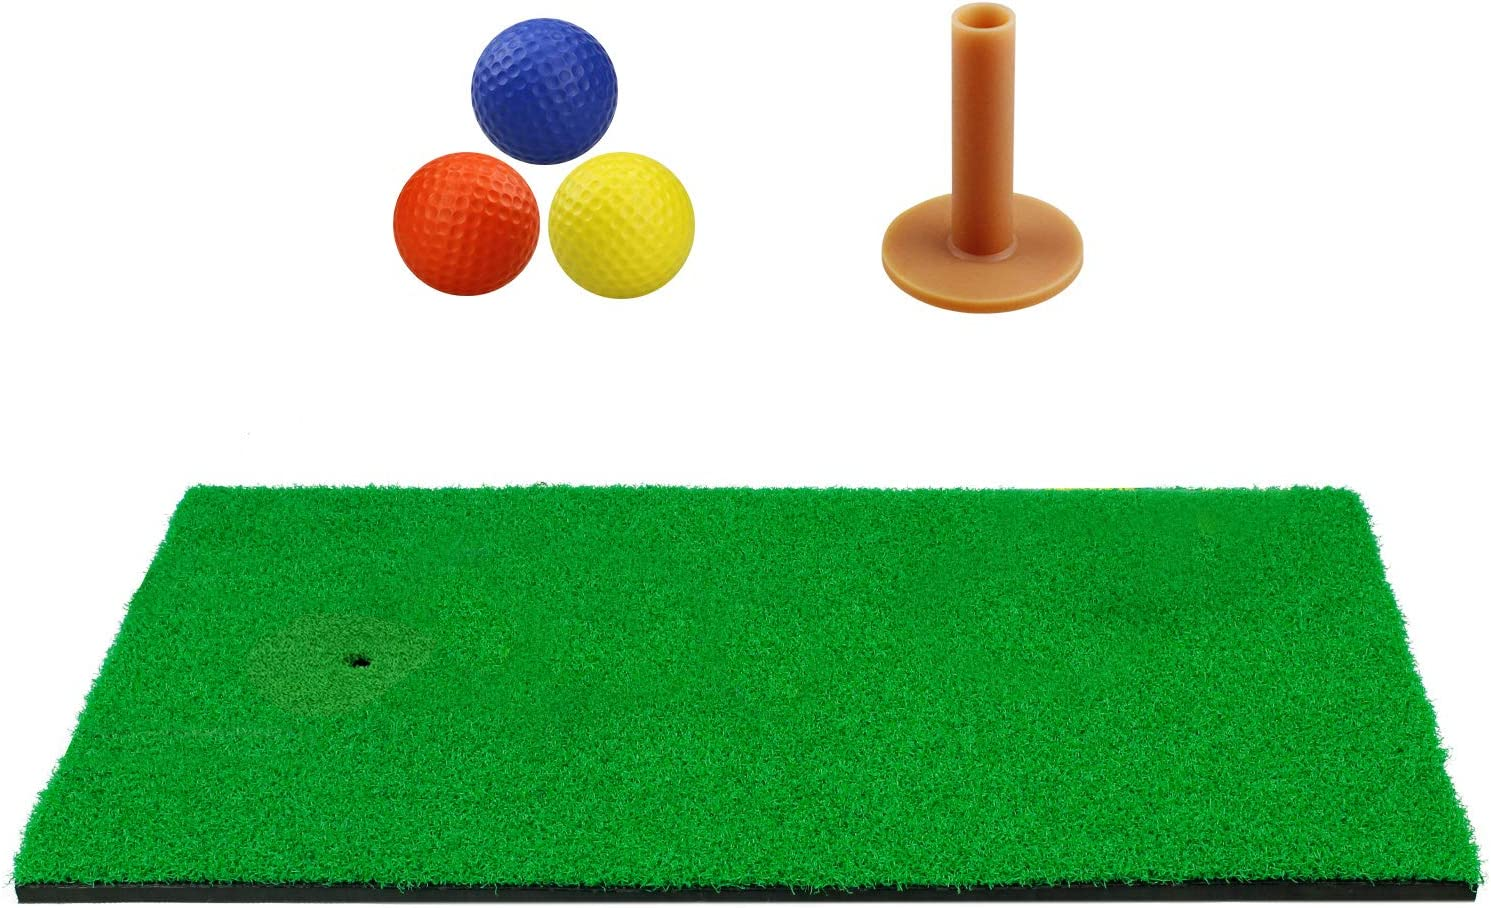 "[Upgraded Version] Timeina 12""x 24"" Golf Practice Hitting Mat with Tee Balls, Pro Foam Dual Turf Golf Mat Pad for Indoor Backyard Golf Chipping Driving Range Target Swing Aids, Portable Hitting Mats"